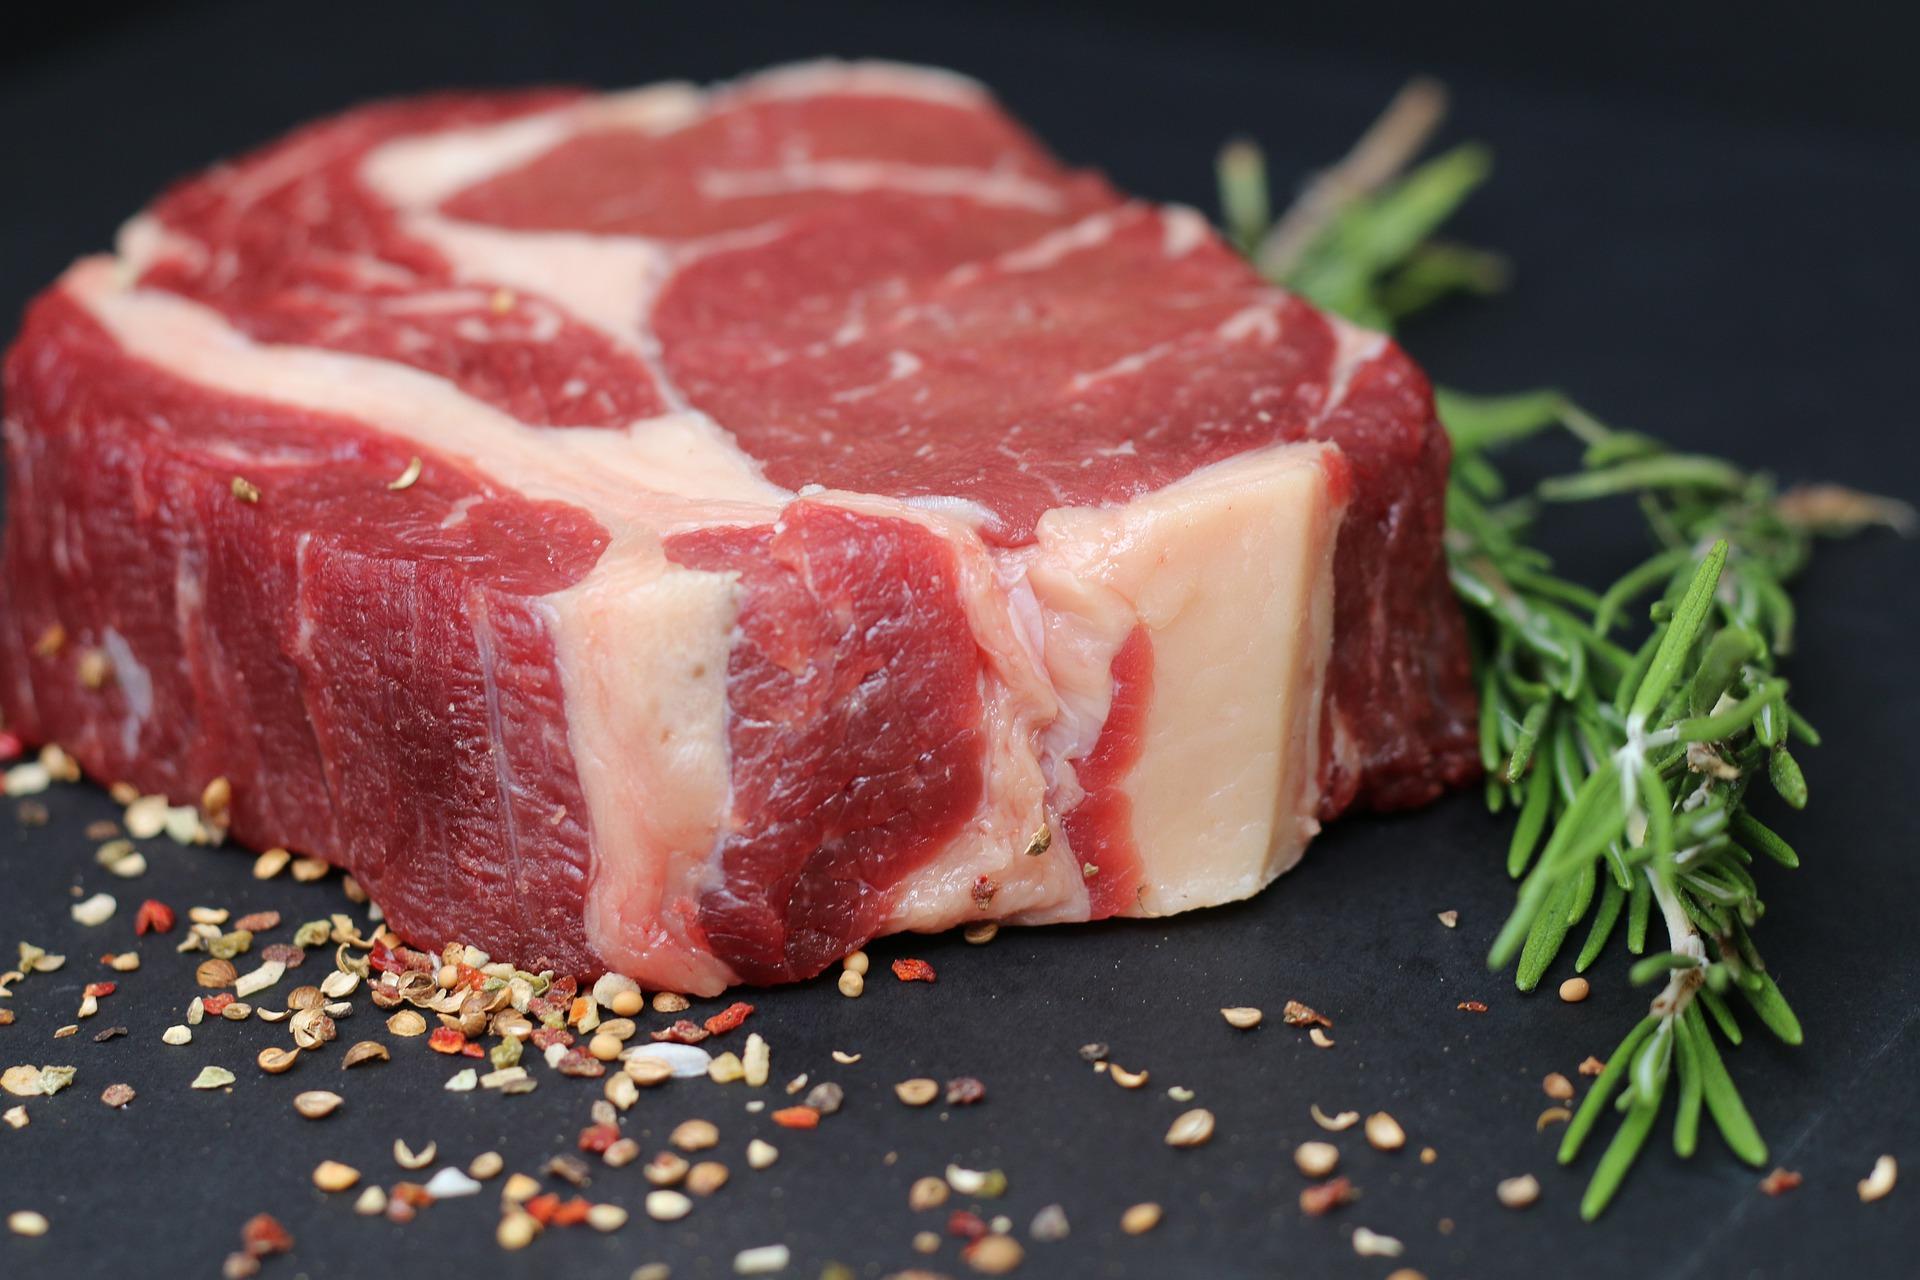 Podatek od mięsa od 2022 r.?